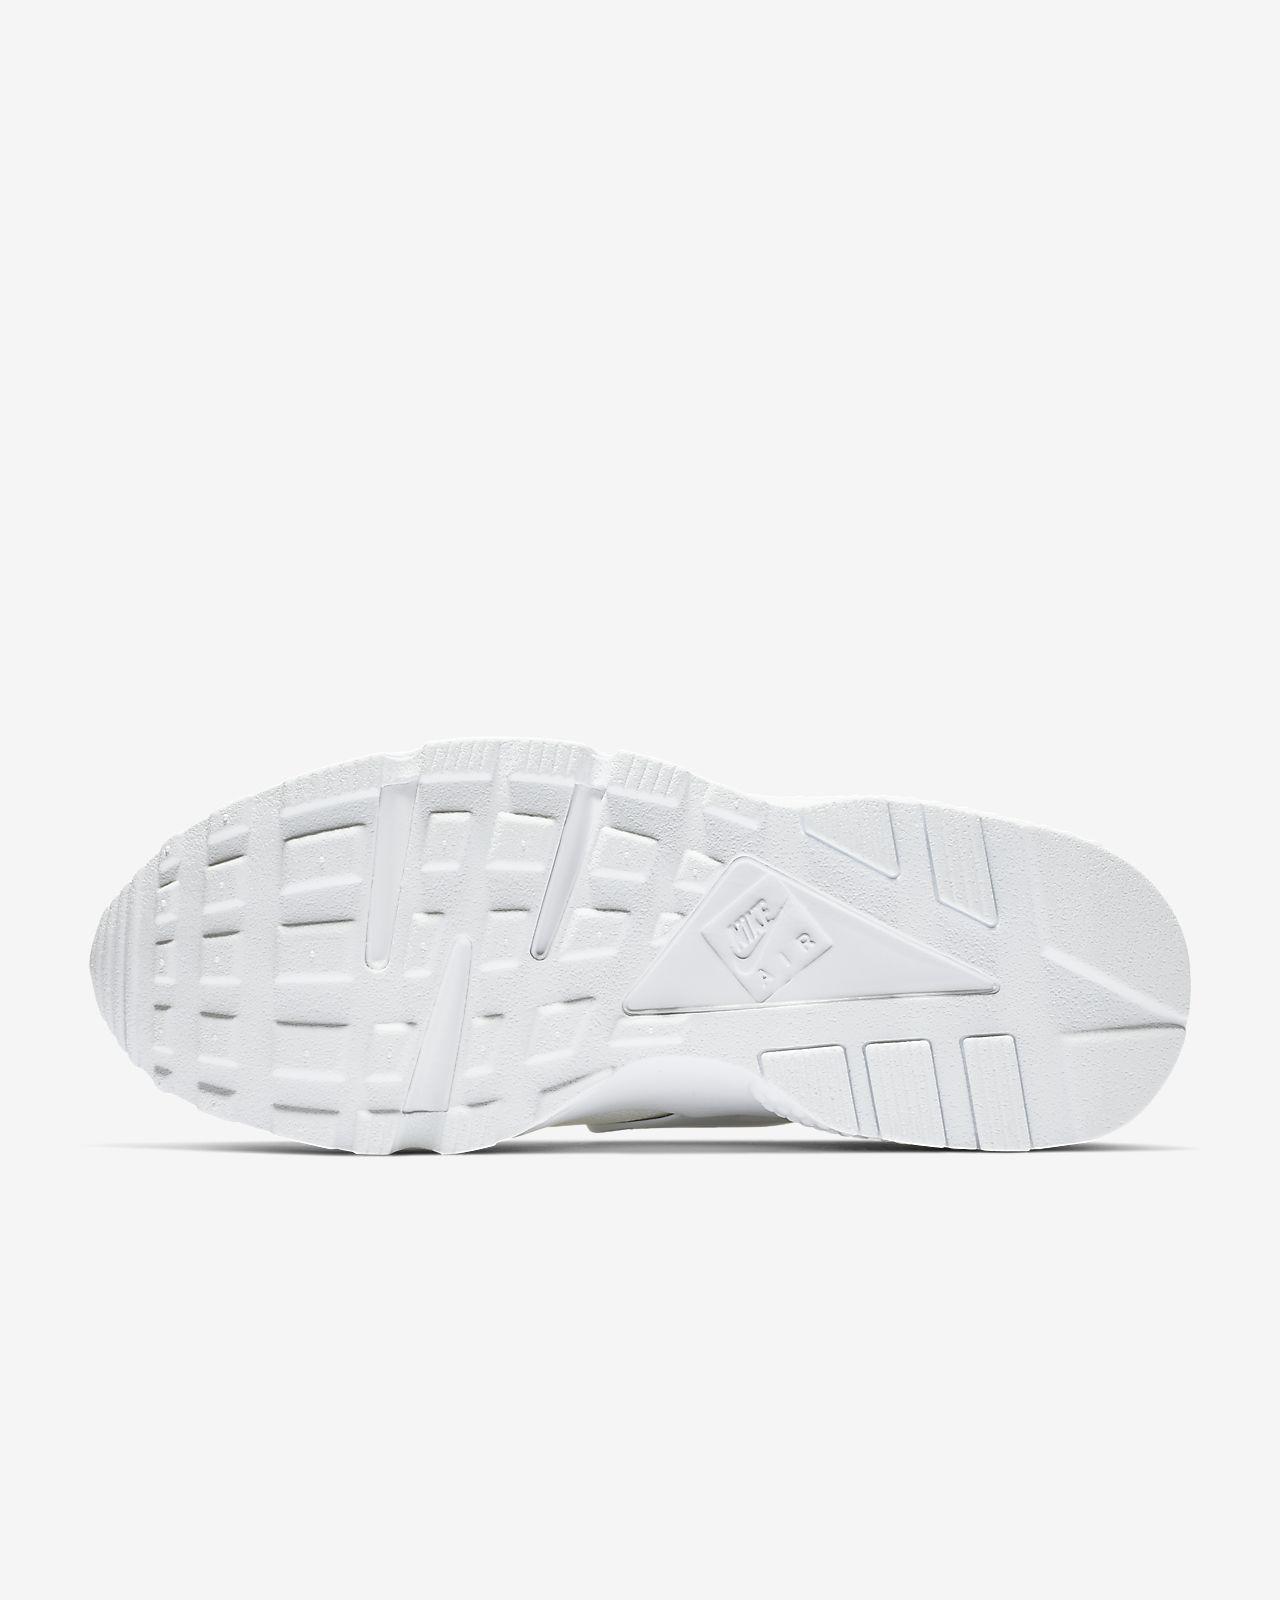 Chaussure Air FemmeFr Nike Pour Huarache iPXZOku